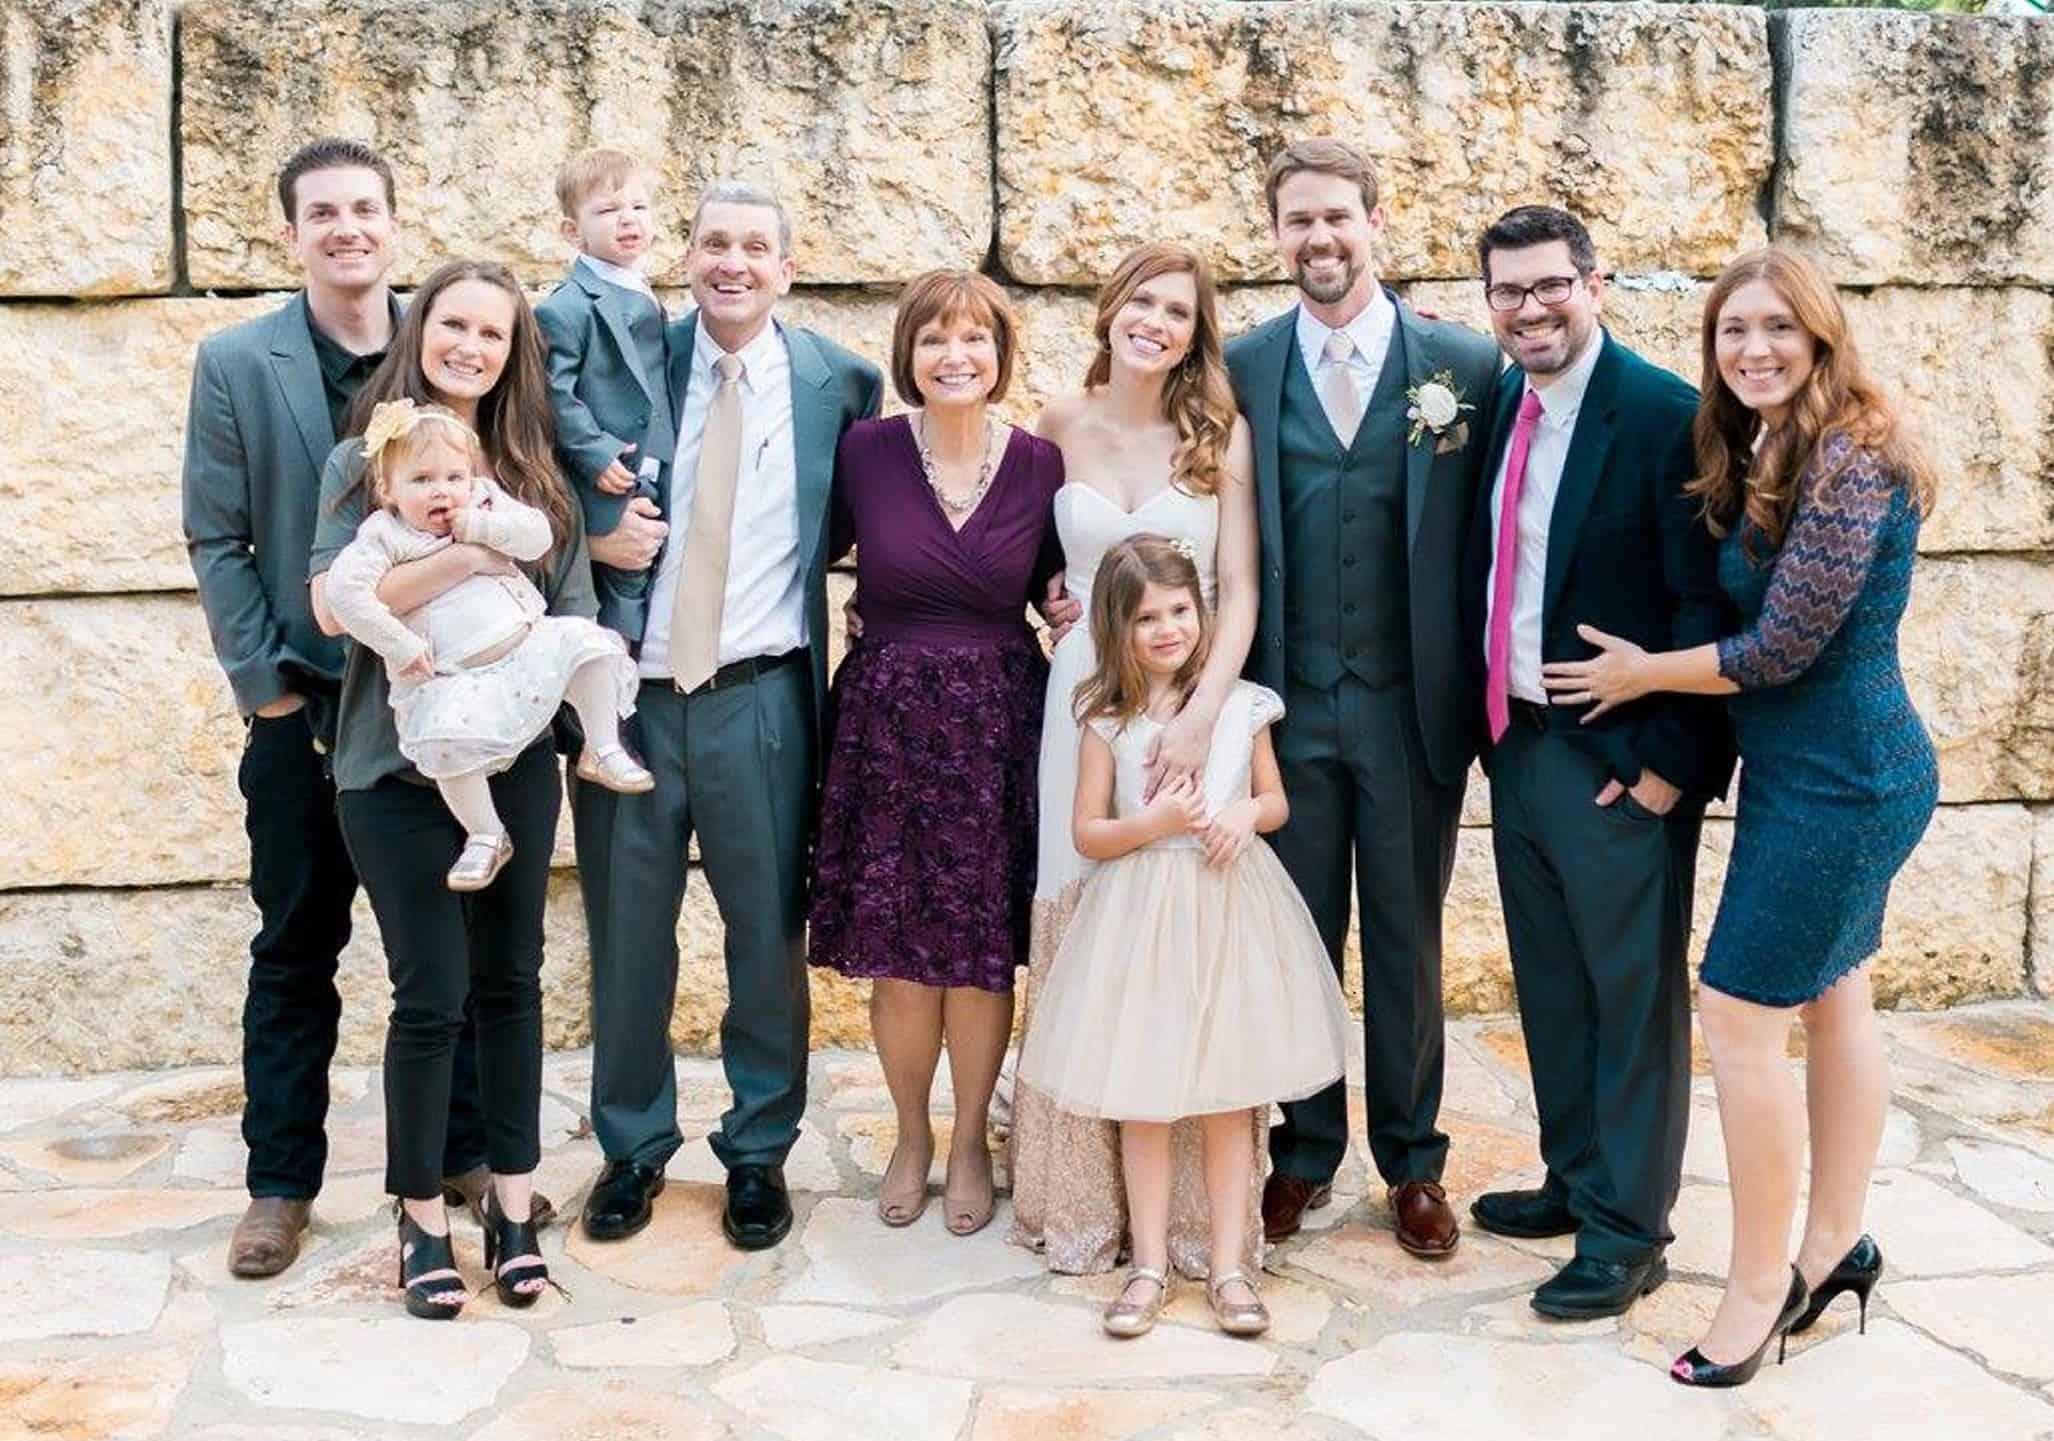 kate-leif-wedding-family-cropped